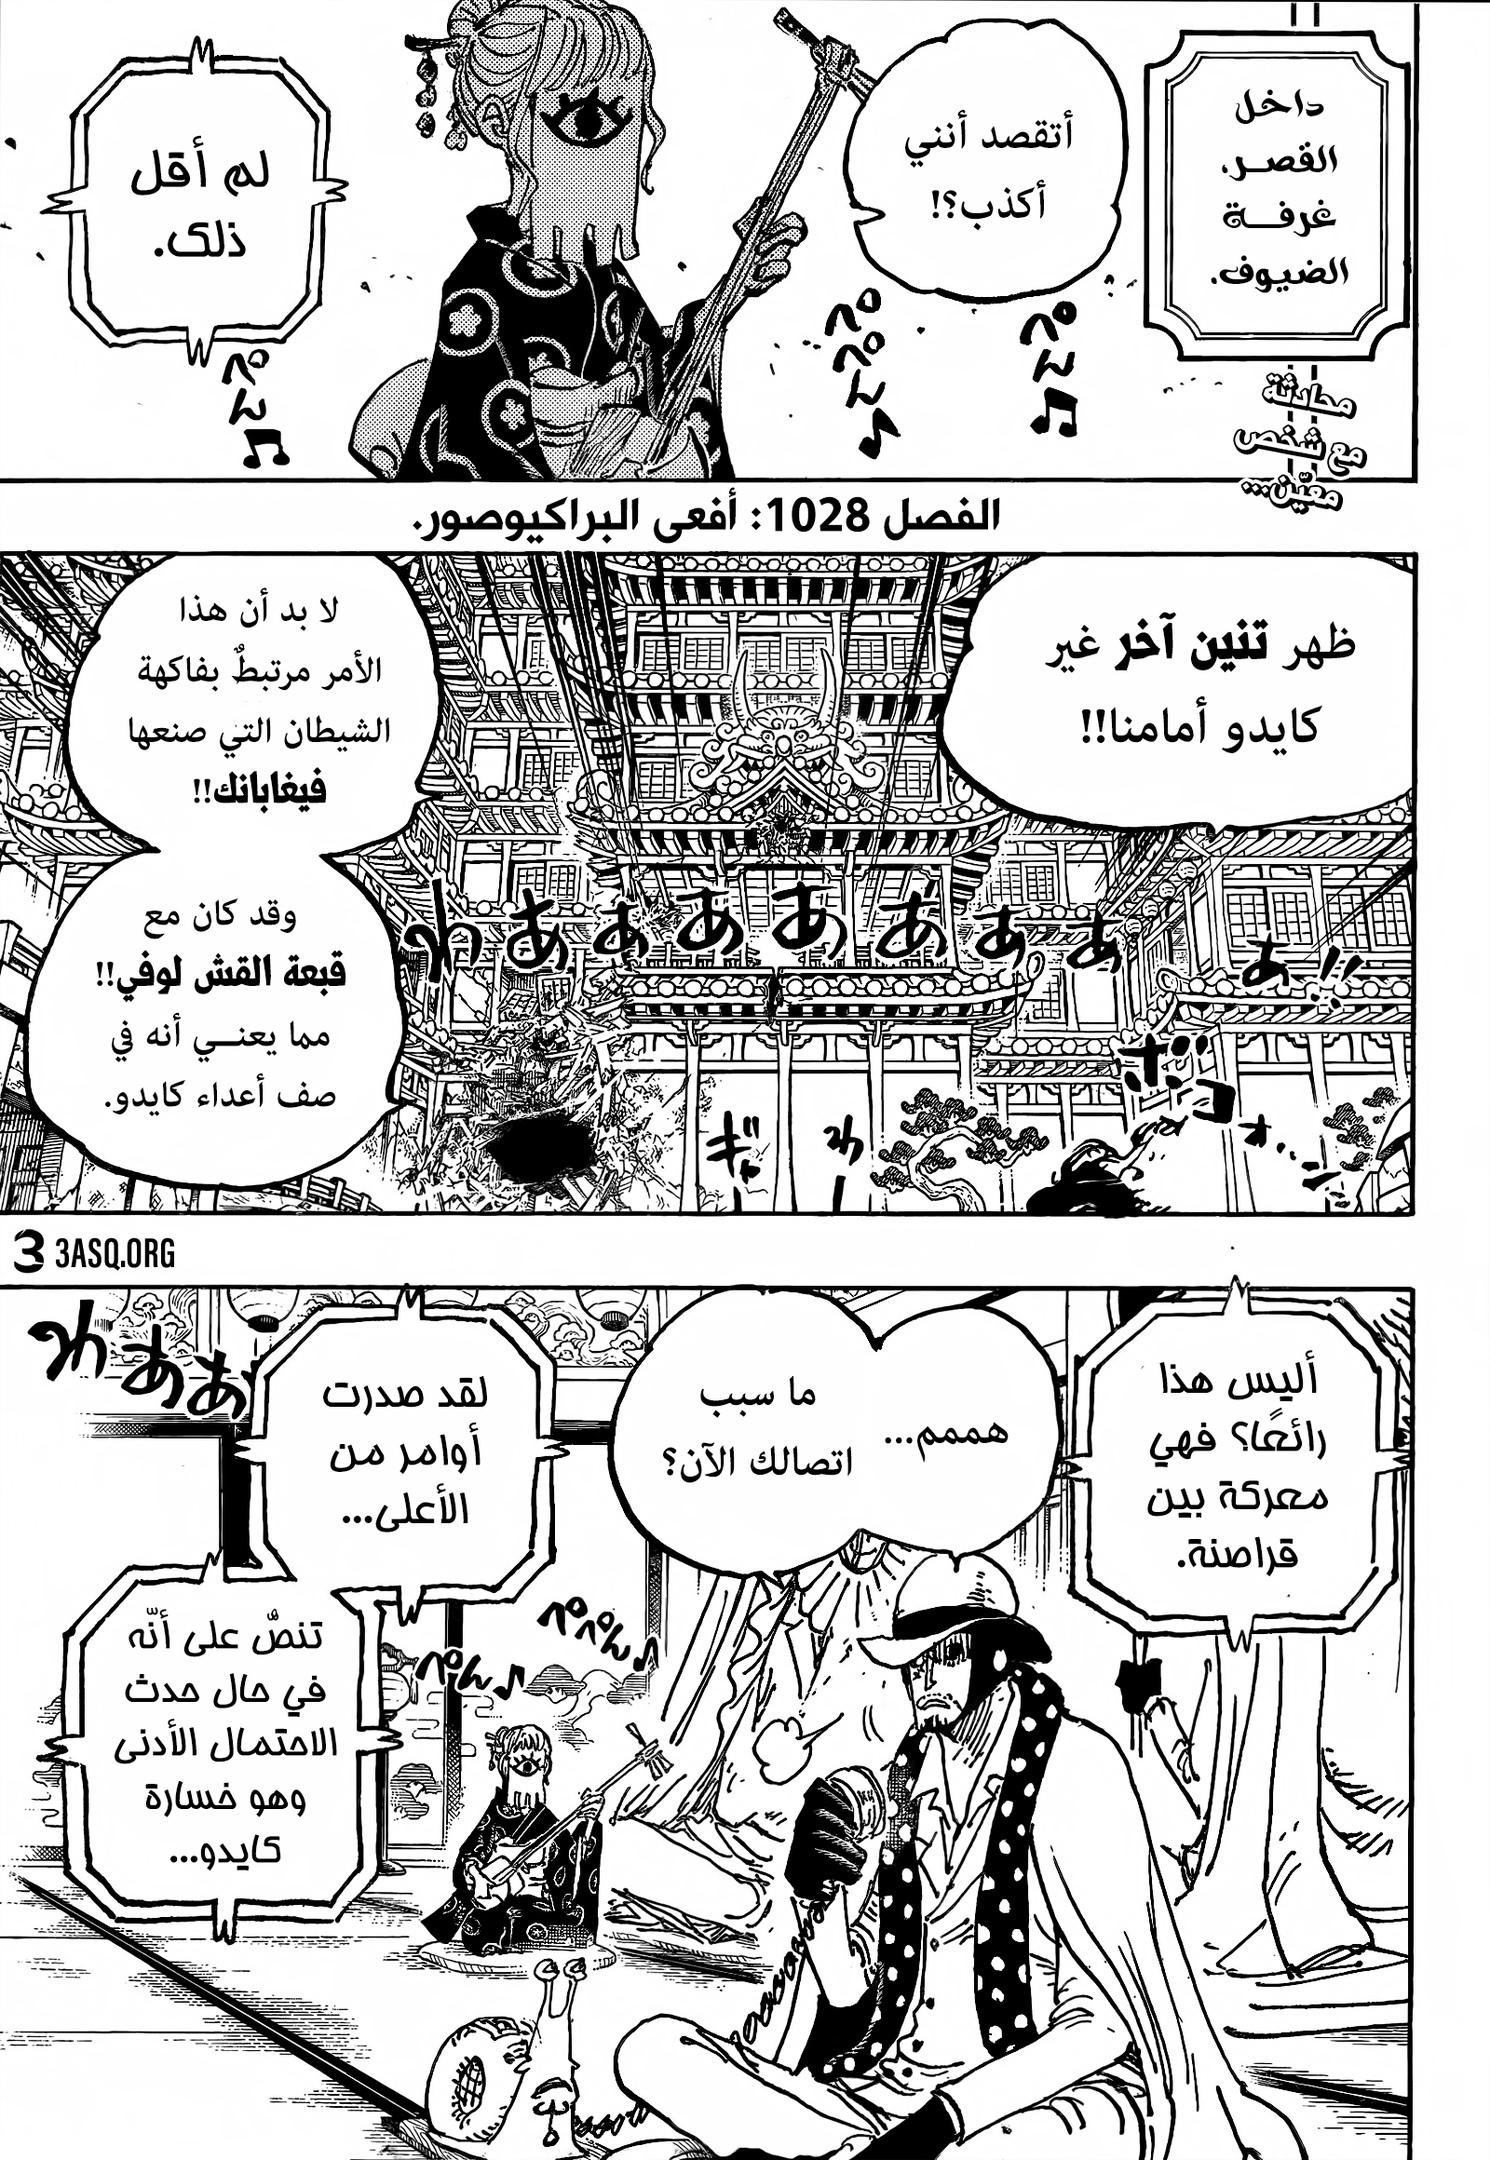 Arab One Piece 1028, image №3